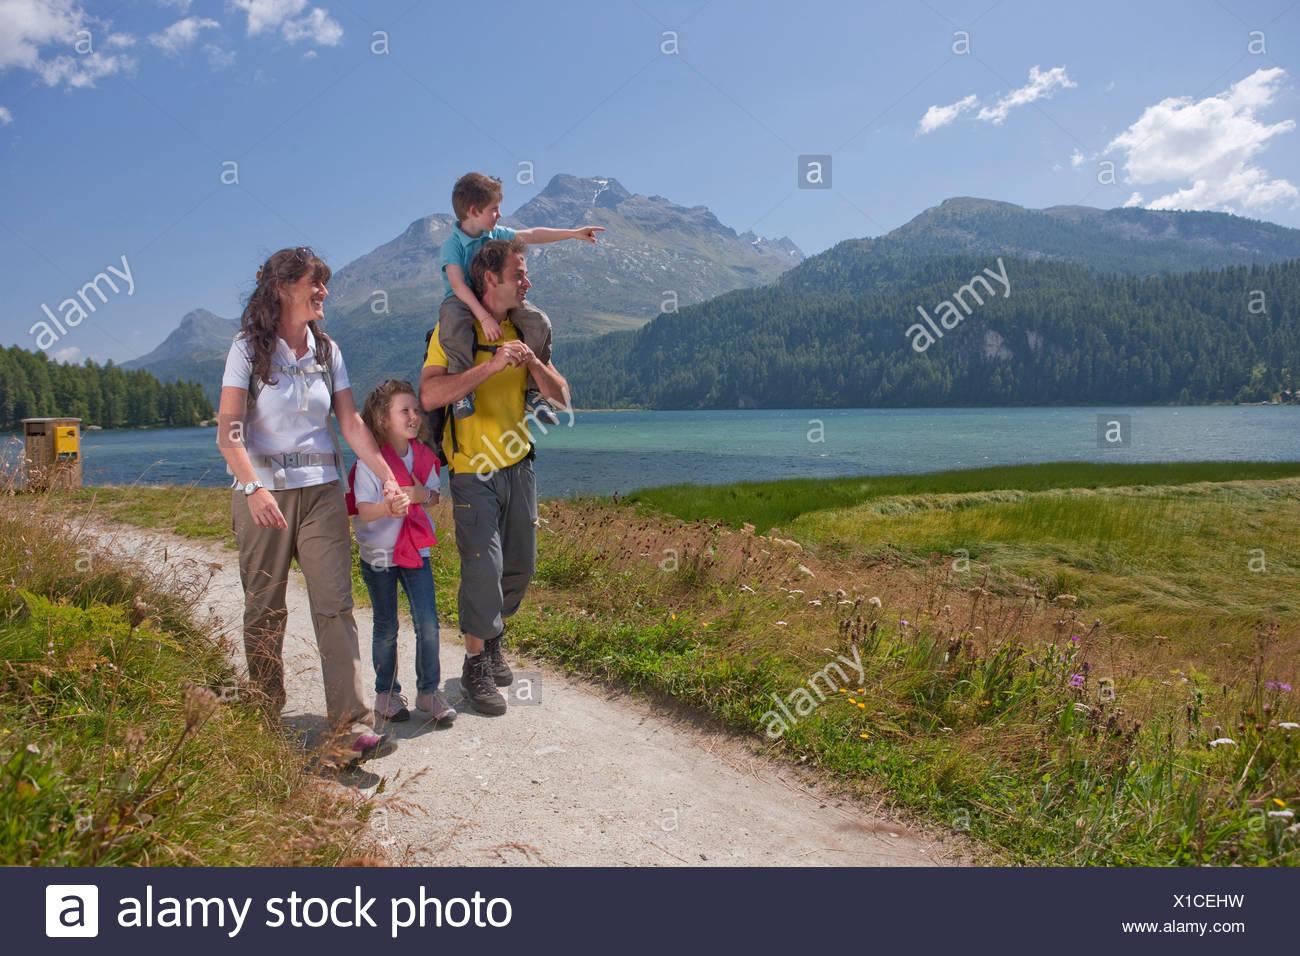 Canton, Graubünden, Grisons, Switzerland, Europe, Engadin, Engadine, Upper Engadine, nature, family, lake, summer sport, footpat Stock Photo